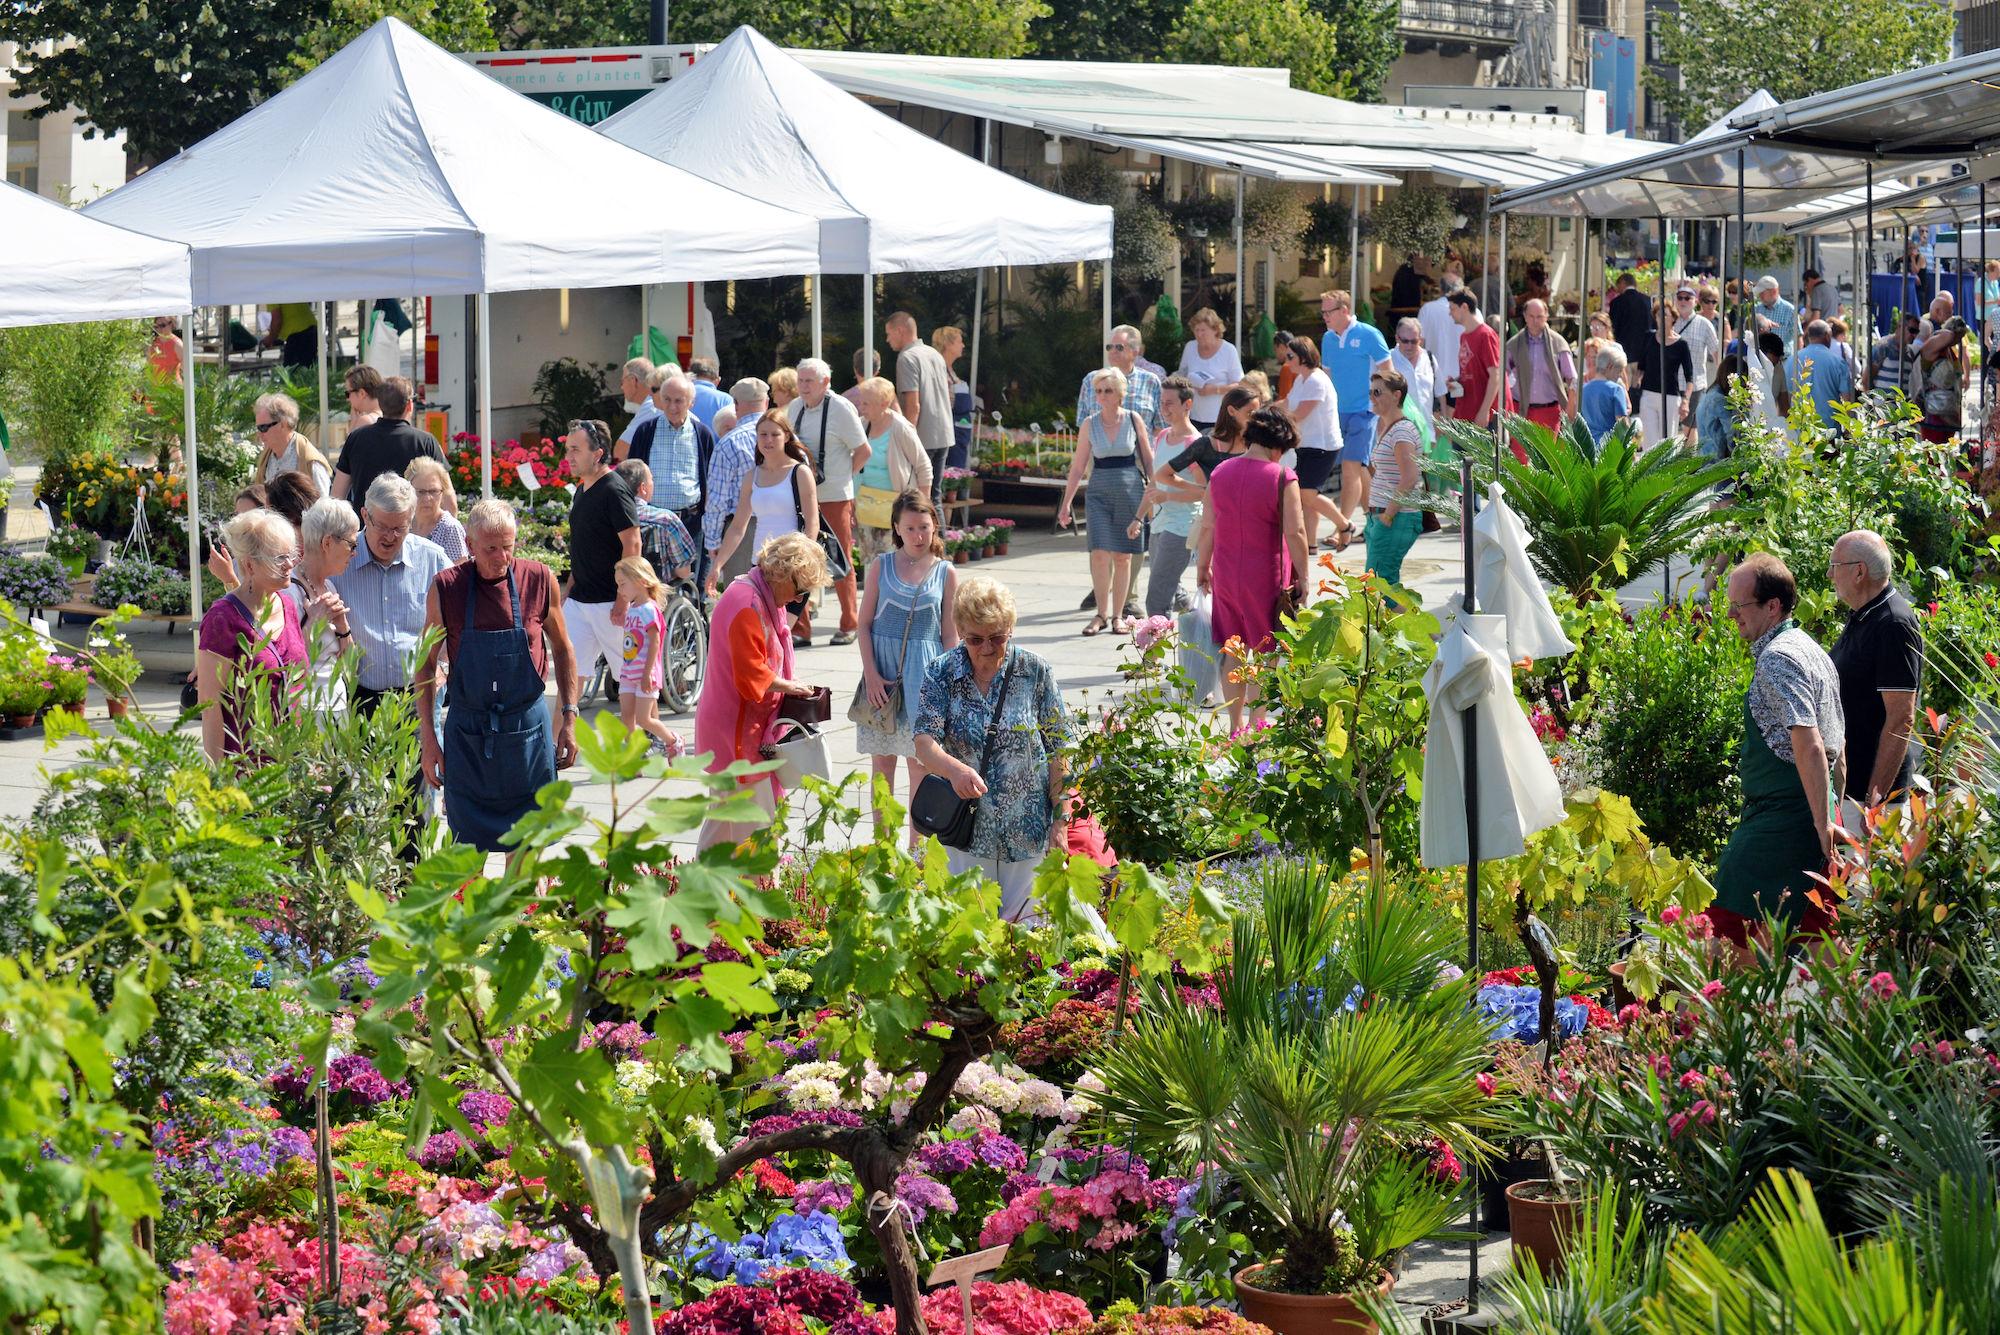 Bloemenmarkt Flower market Ghent Gent Belgium GO Experience travel touroperator reisen turismo